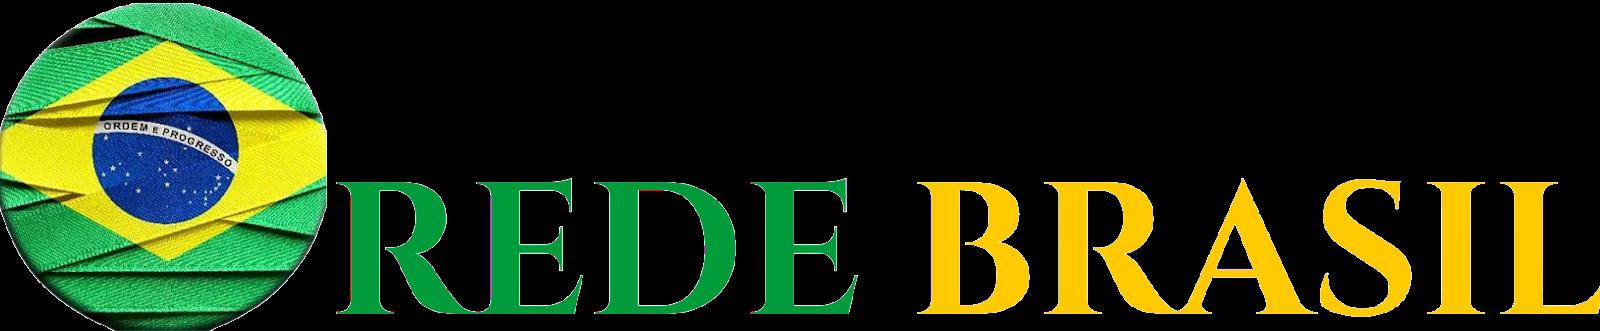 Rede Brasil News